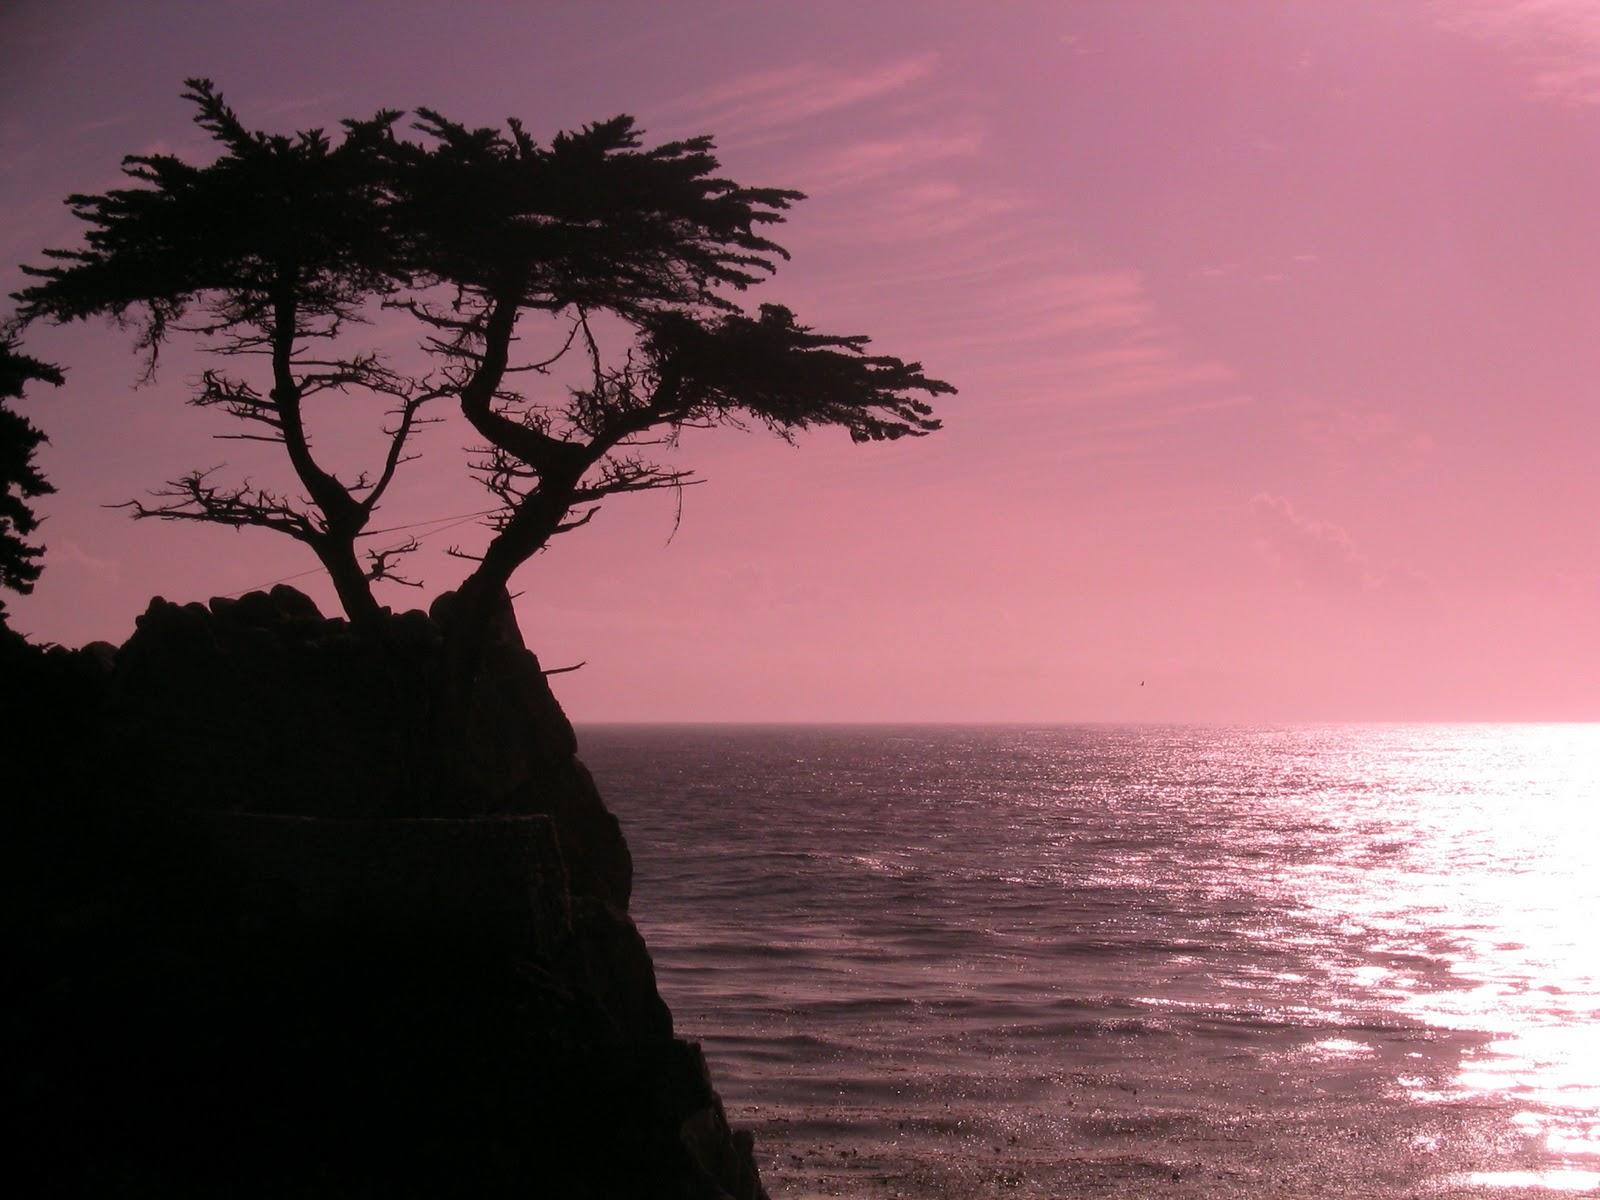 California Beach Sunset Cyprus Point Photo Wallpaper Beach Wallpaper 1600x1200